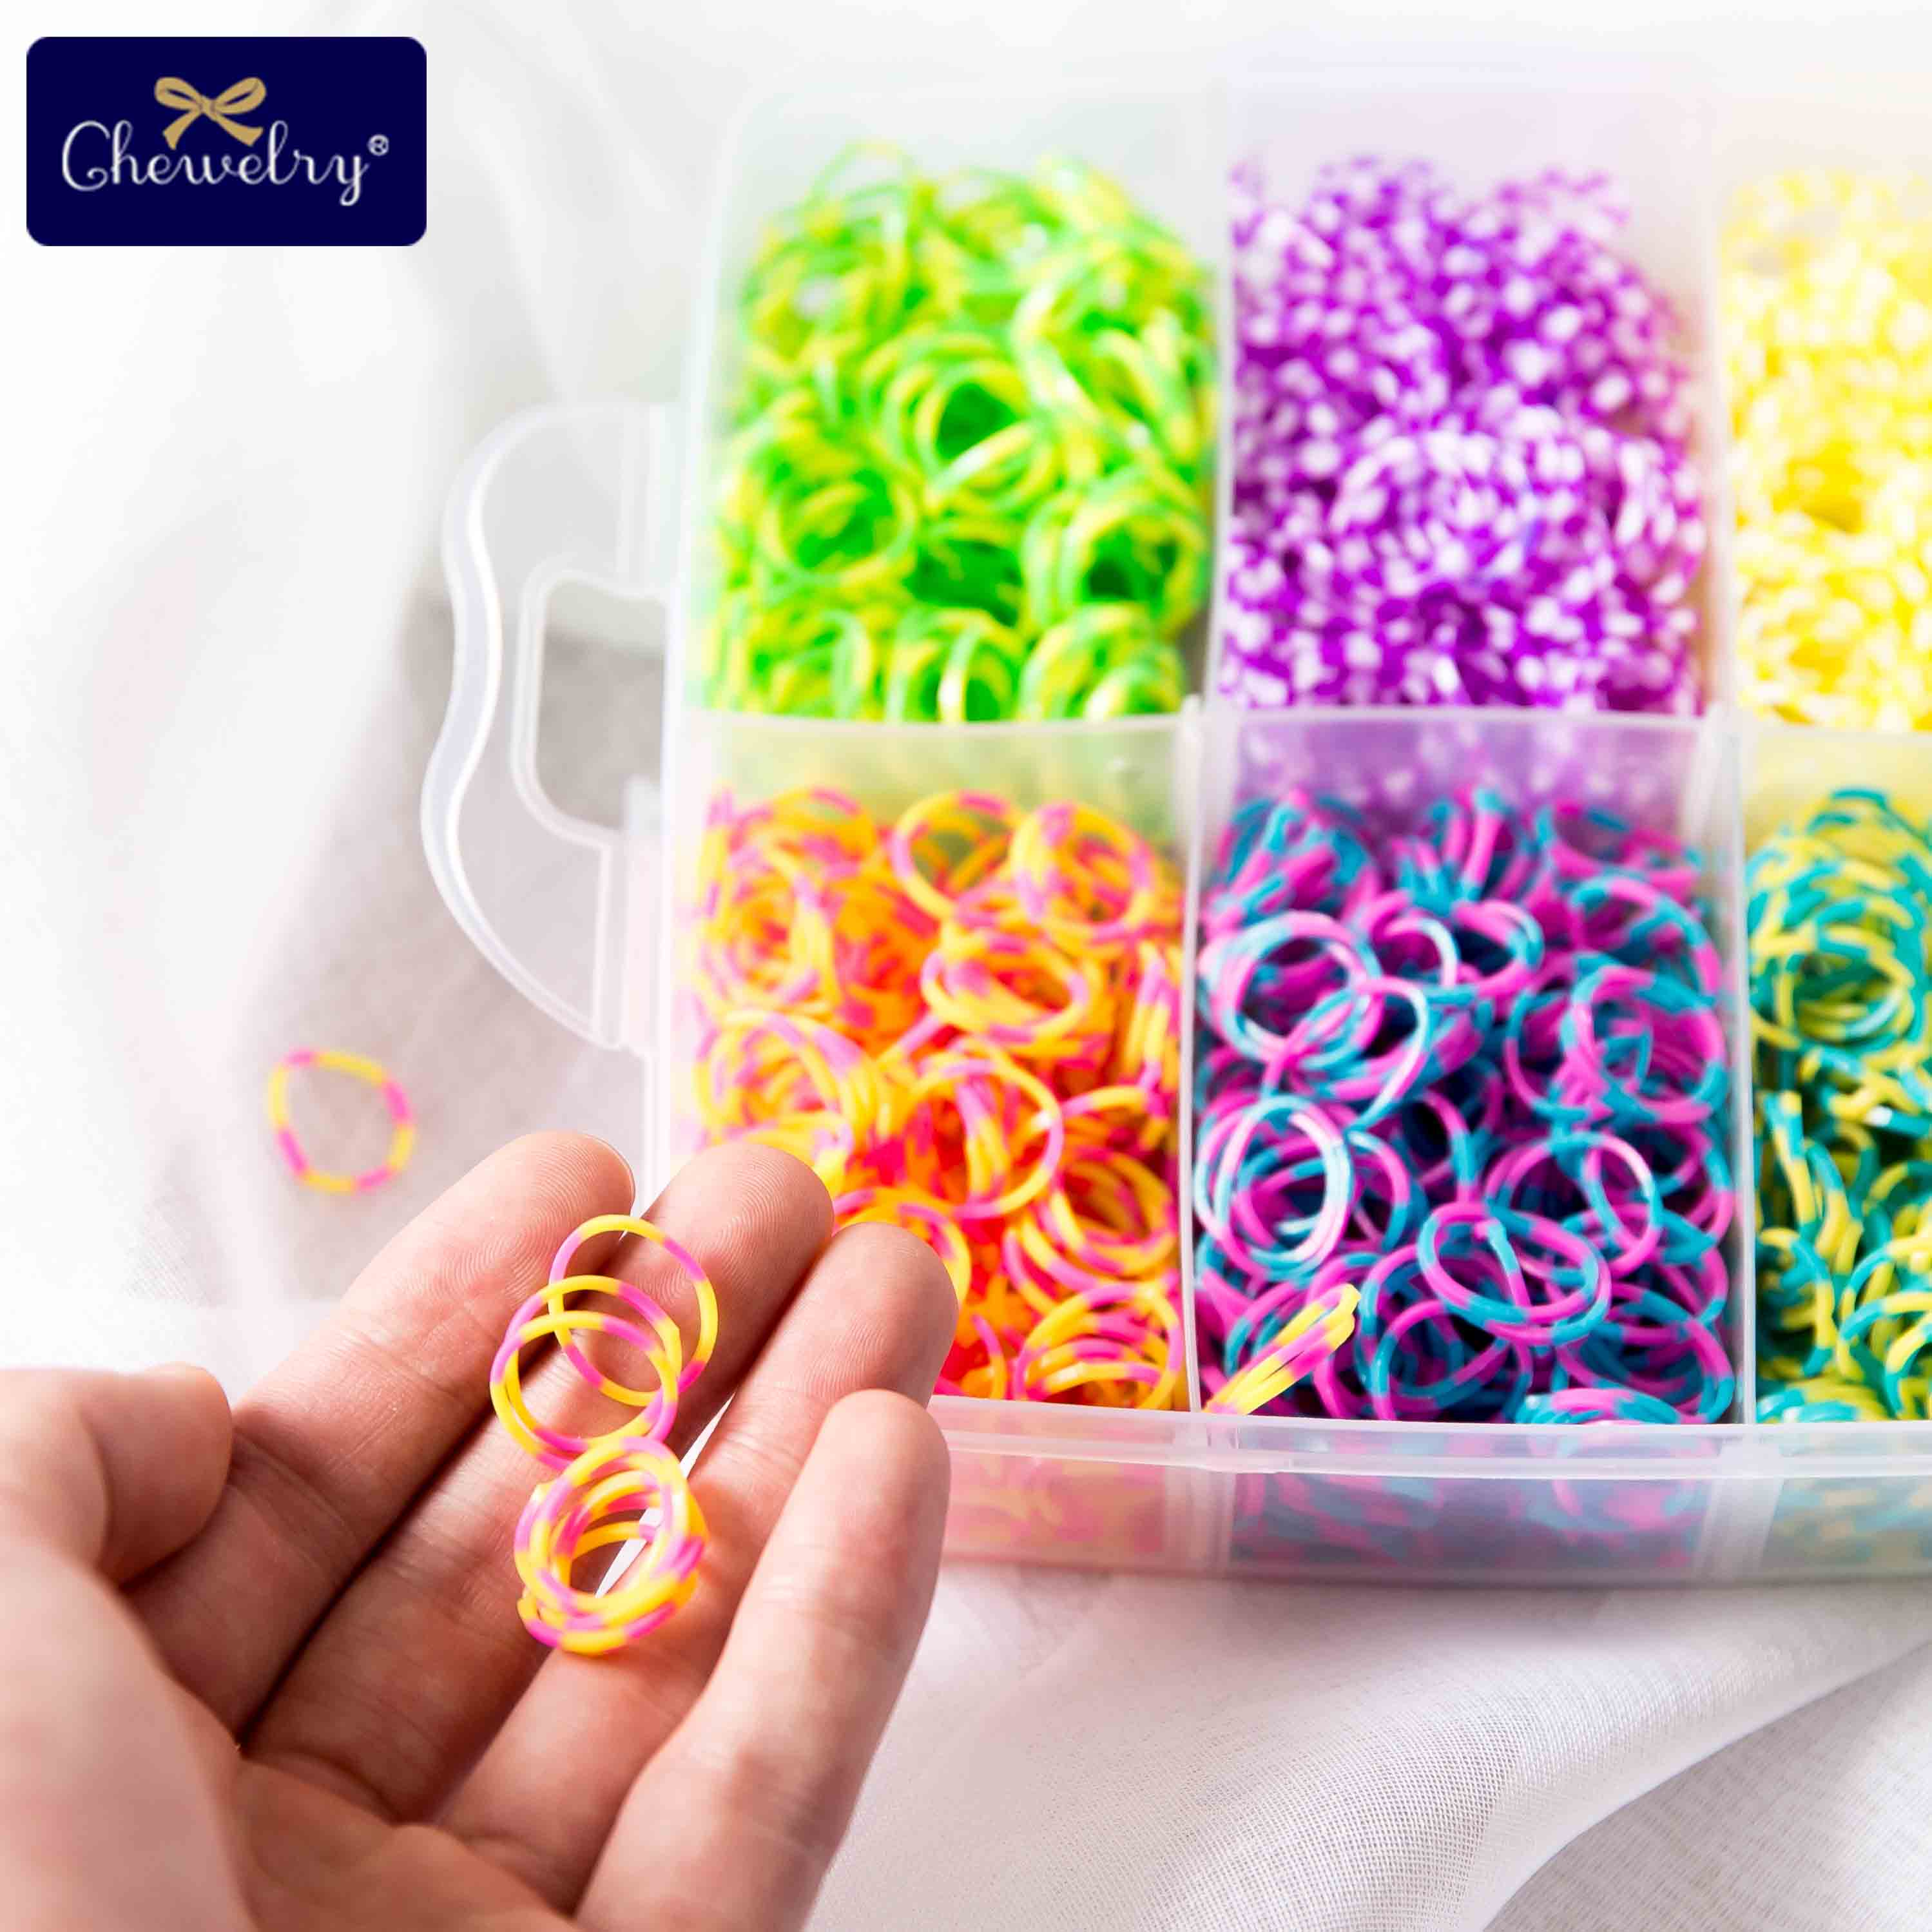 1800pc Elastic Rubber Loom Bands Kids Weaving Bracelet Toys Rainbow Rubber Girl Braid Plaits Accessories Children'S Goods Gifts